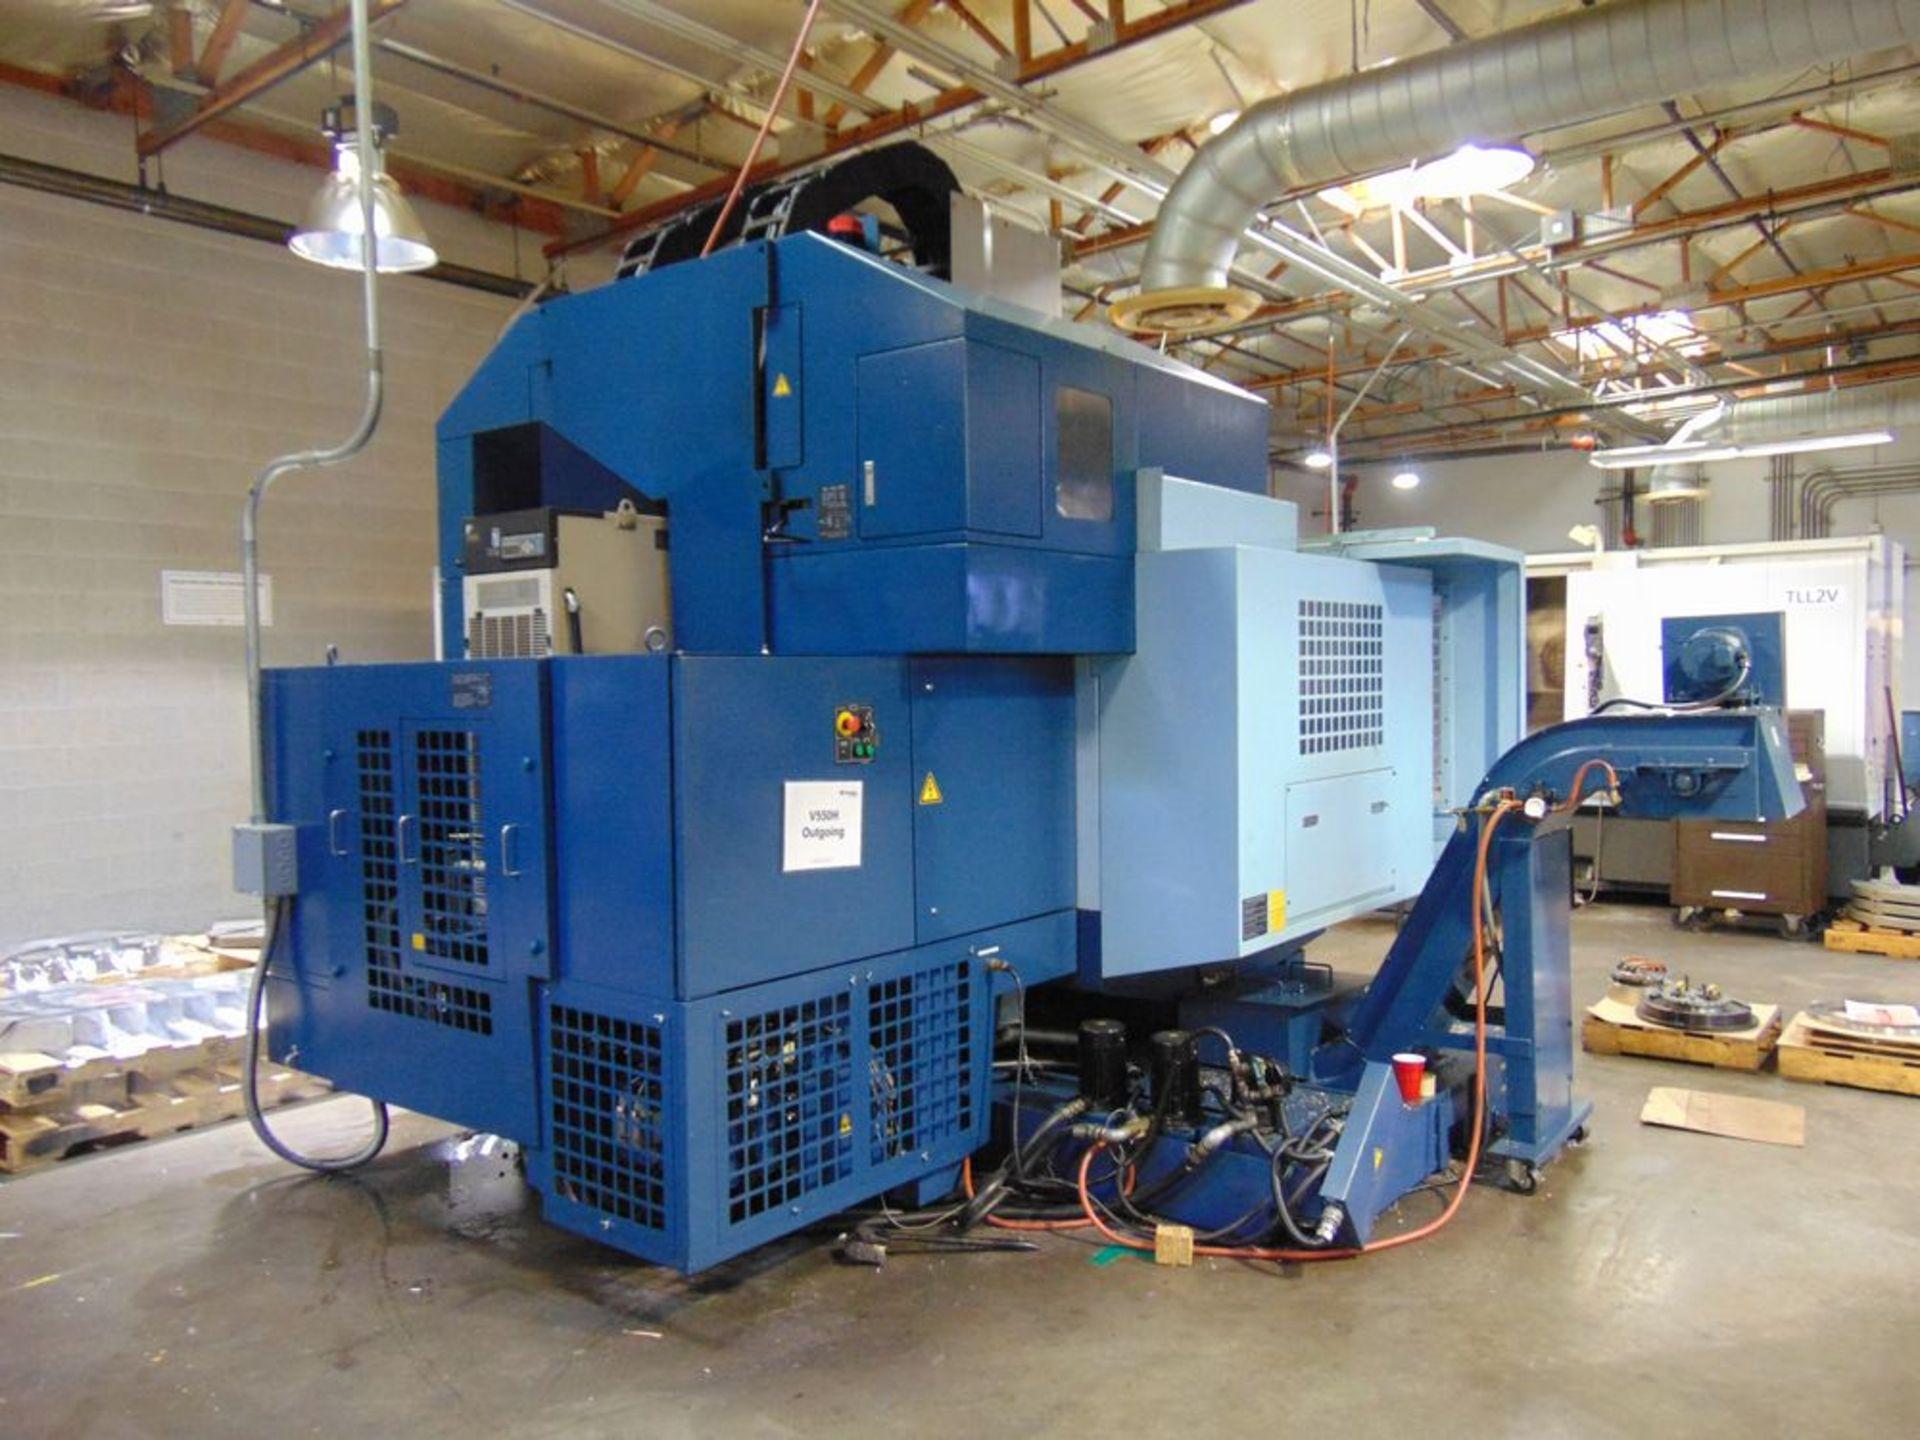 Lot 30 - (2000) Matsuura mod. MC1000 VGDC, 5-Axis CNC Vertical Machine Center, ATC, Turbo Chip Conveyor (No